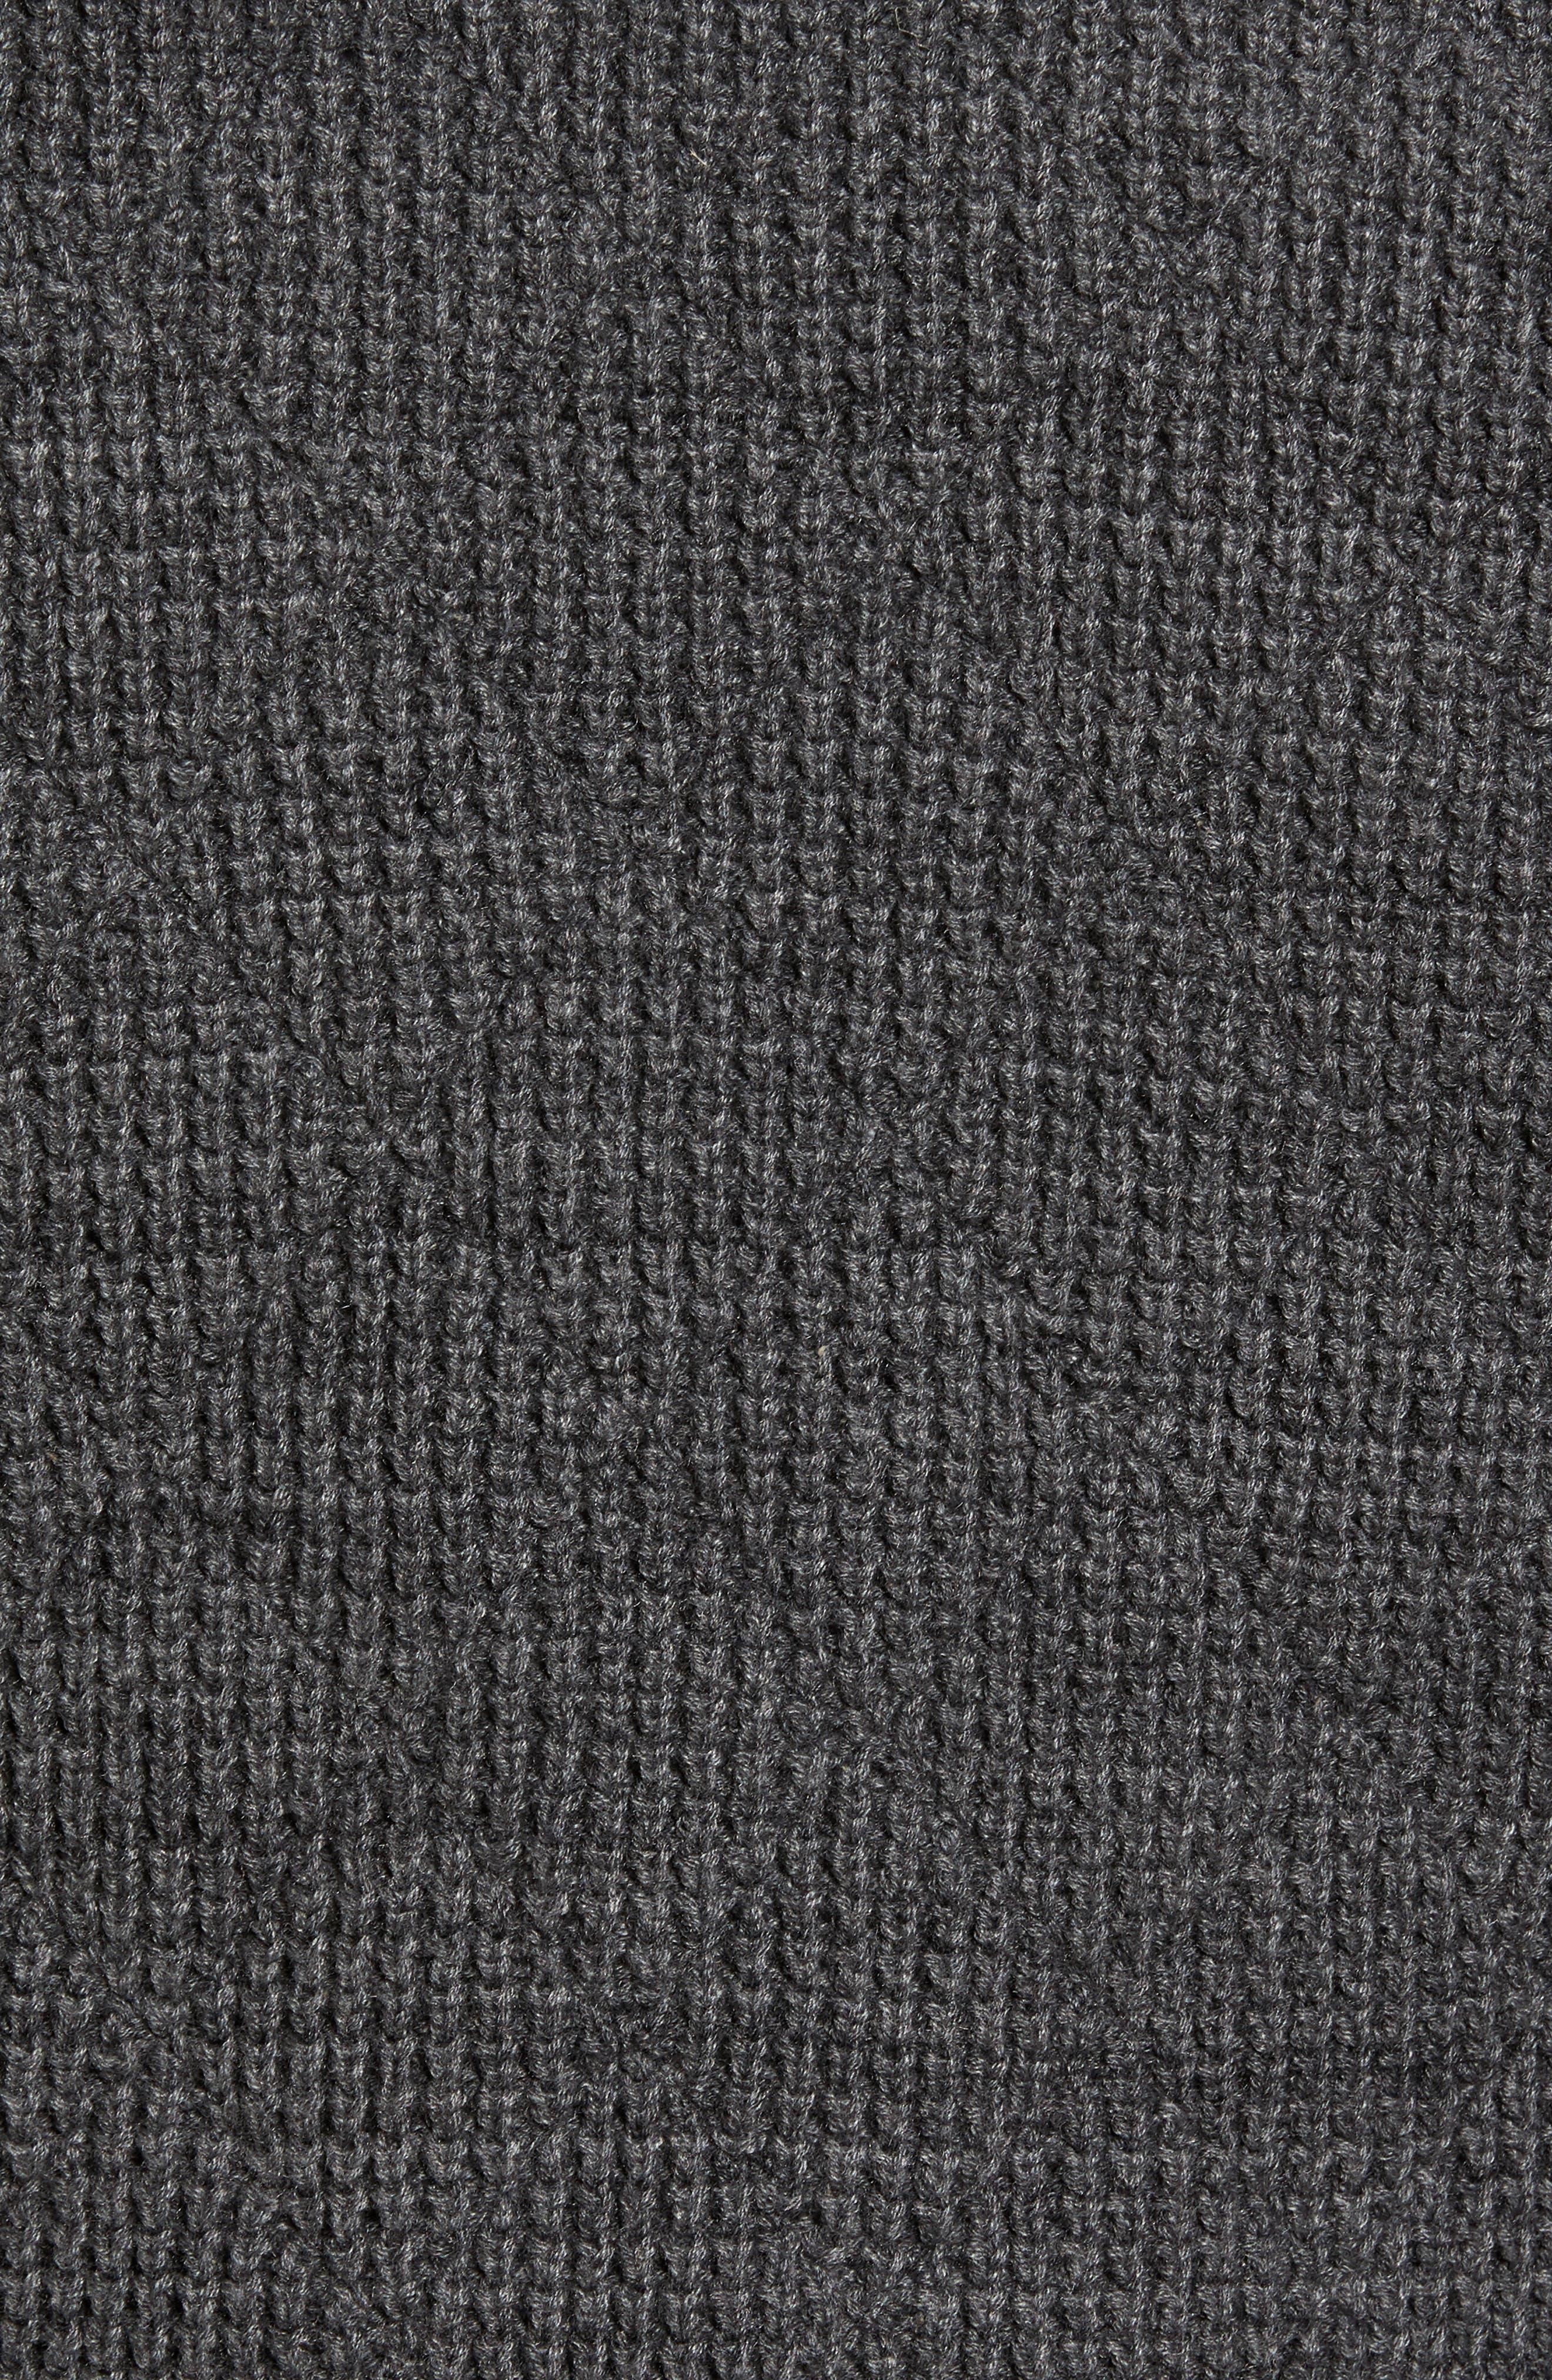 Mixed Media Full Zip Sweater,                             Alternate thumbnail 5, color,                             021